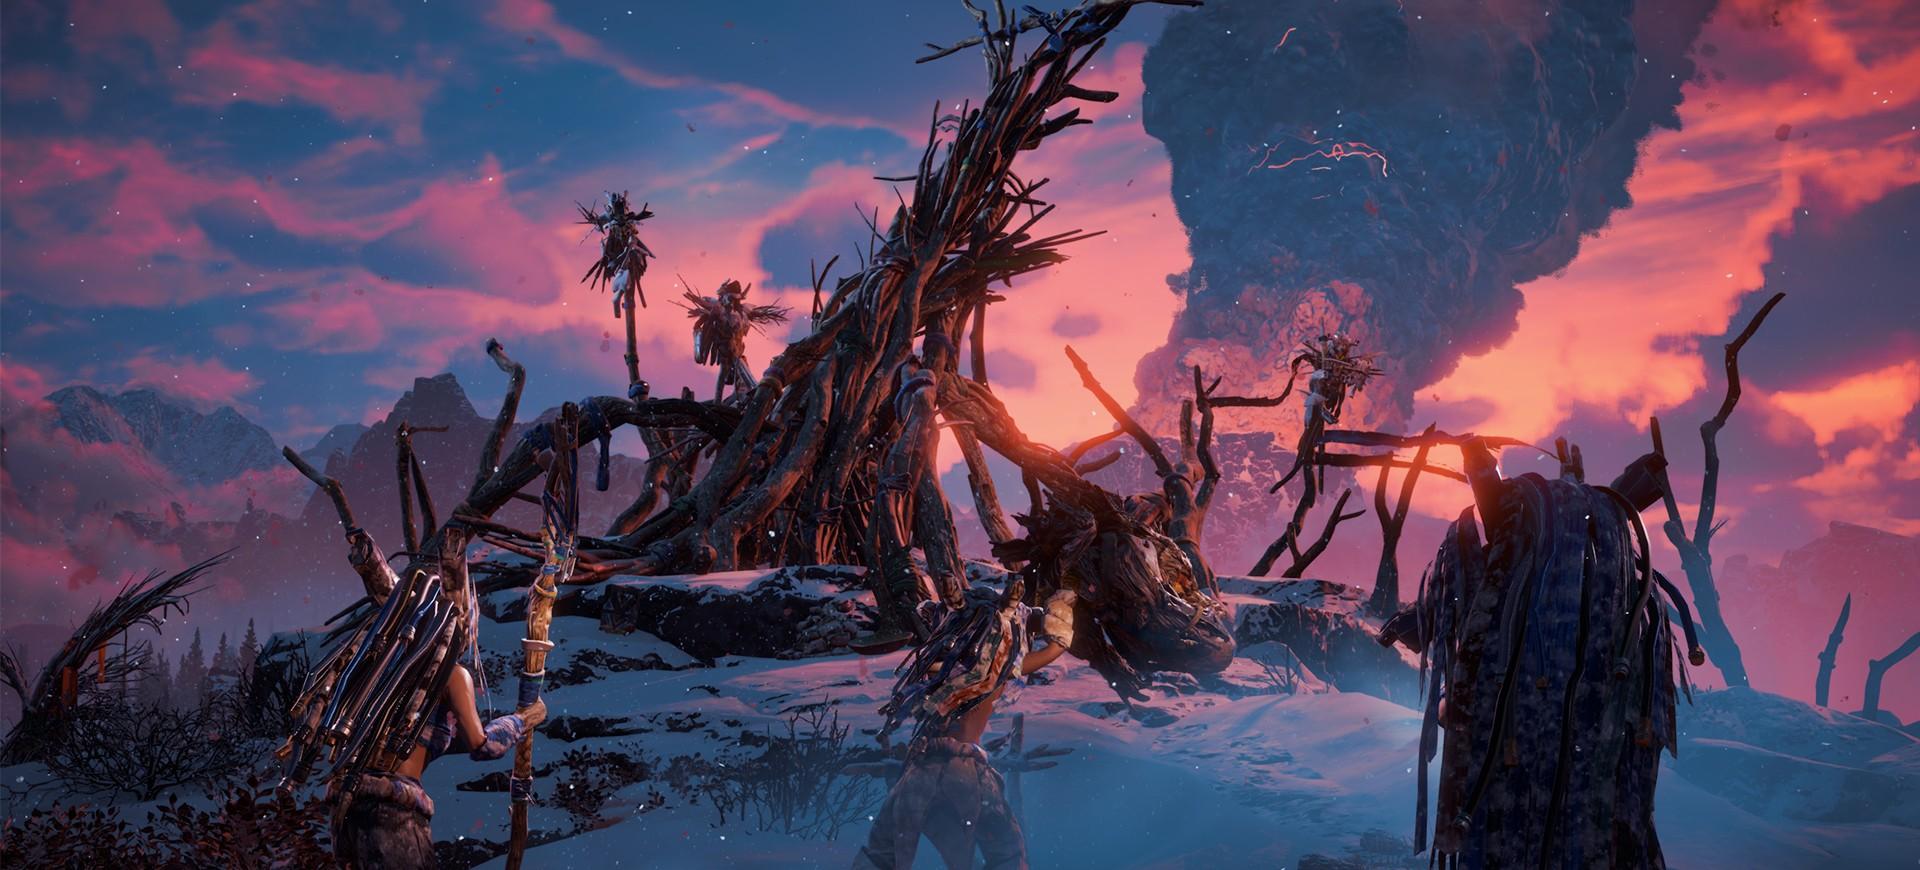 Horizon Zero Dawn: The Frozen Wilds - Đánh Giá Game